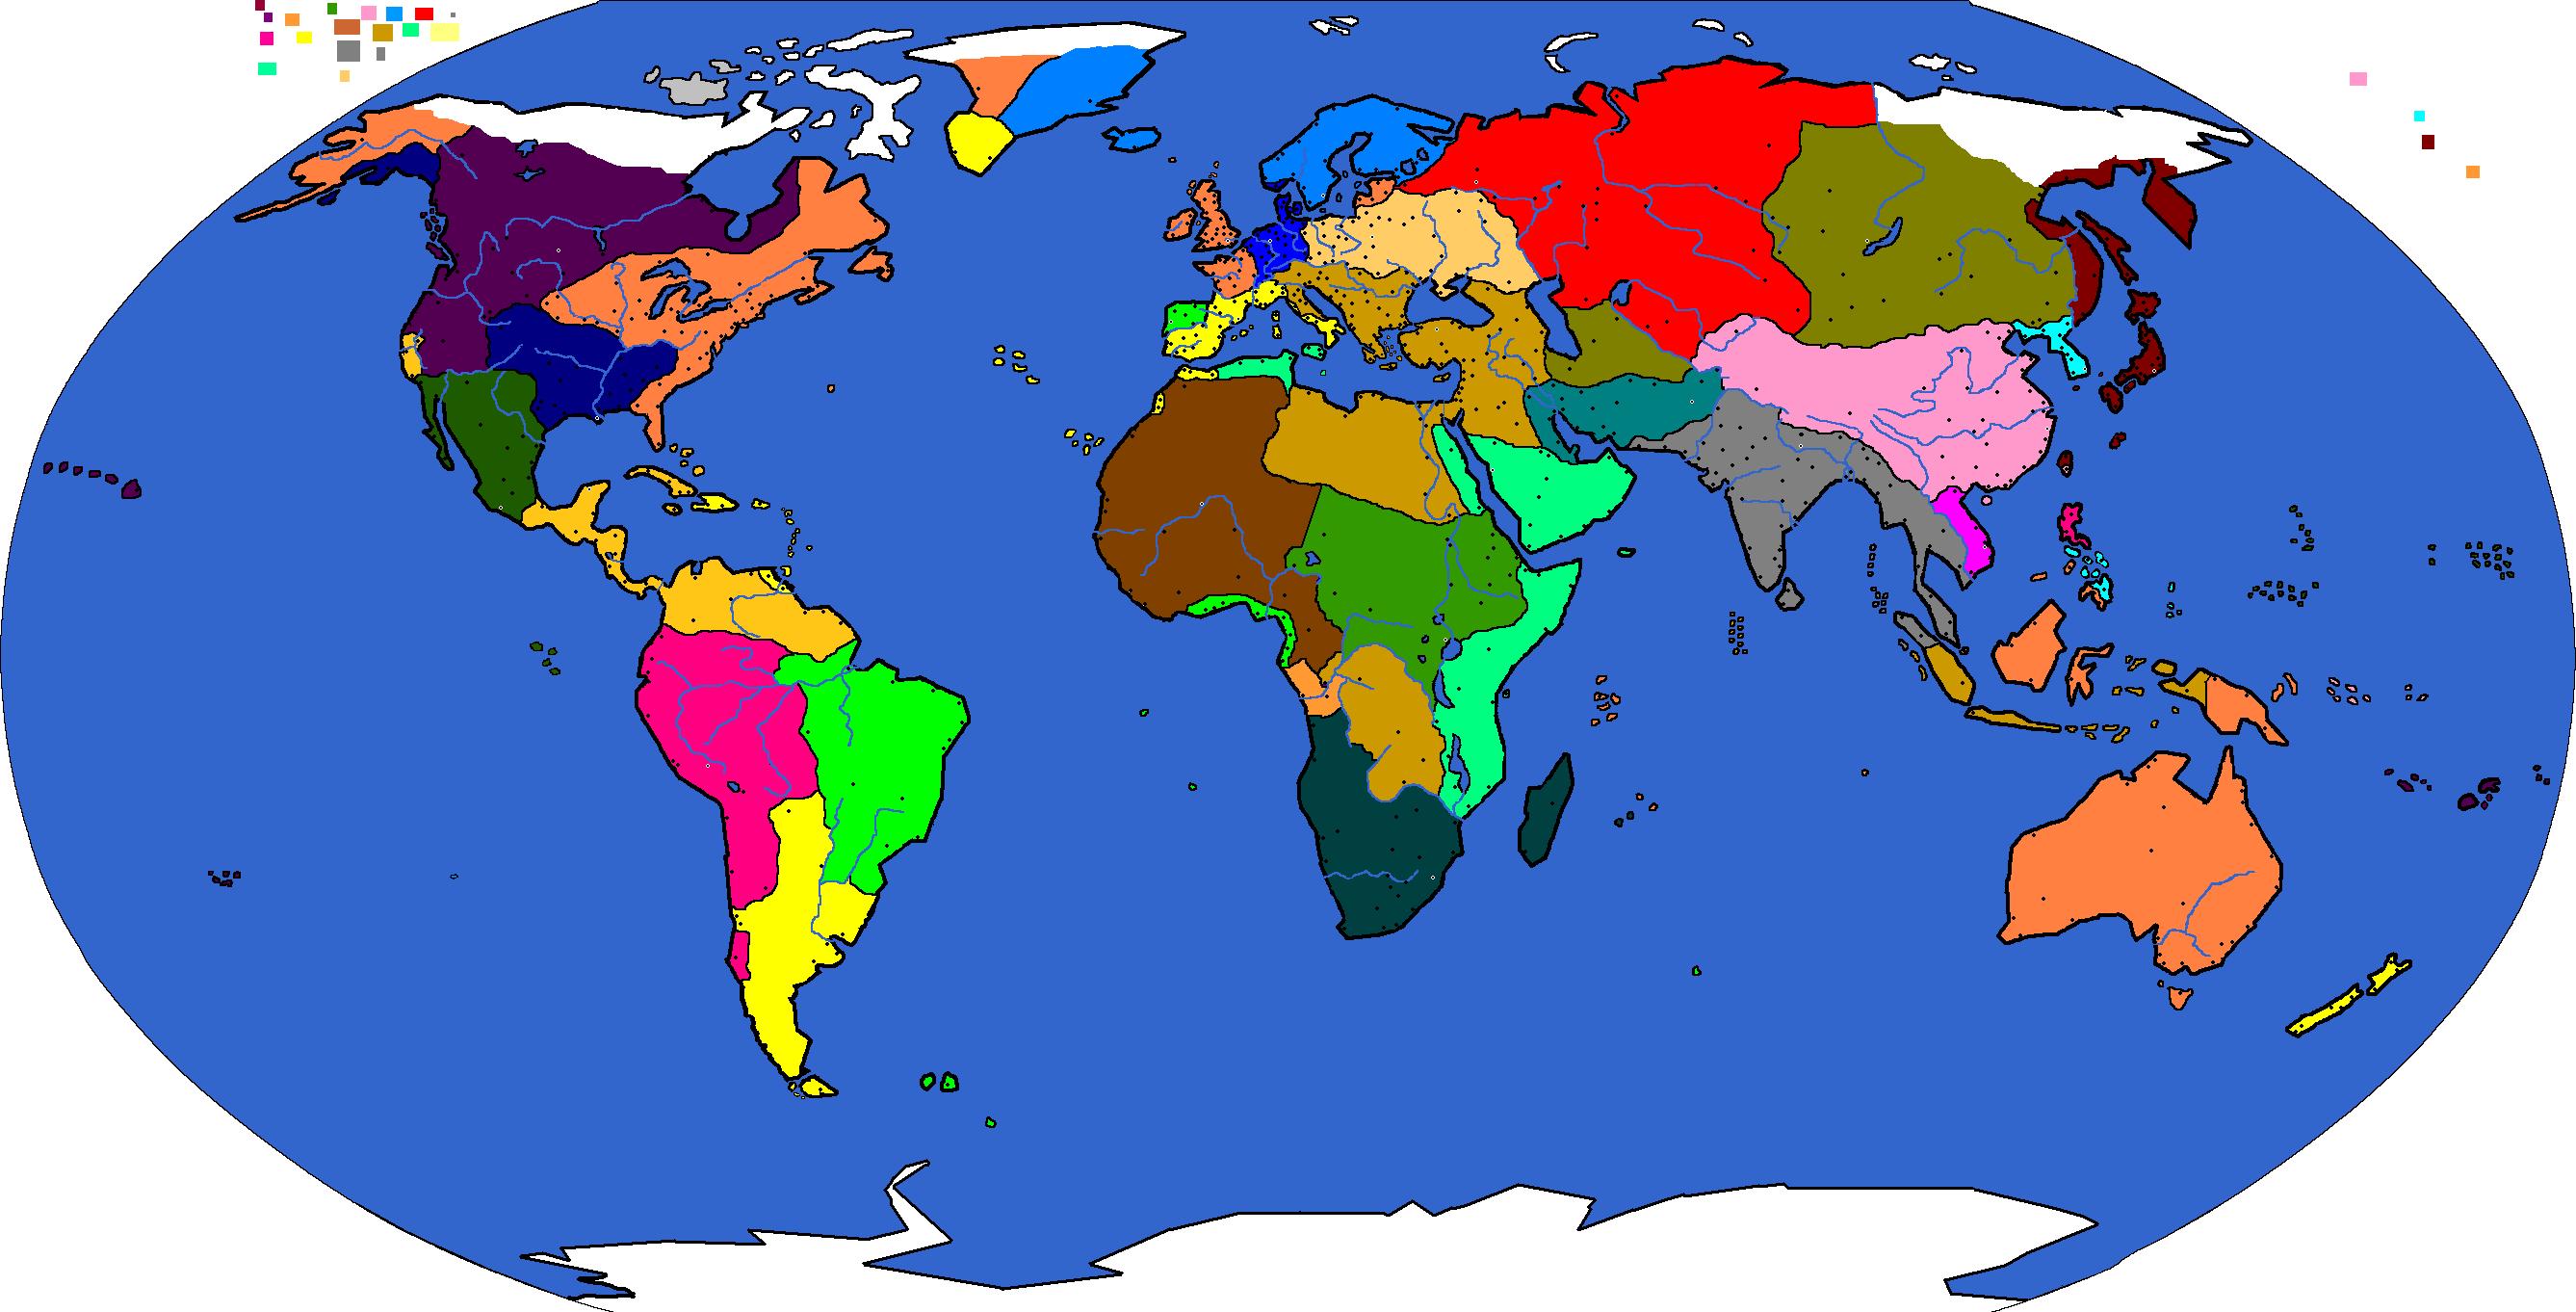 2025 : World Map | Page 2 | CivFanatics Forums